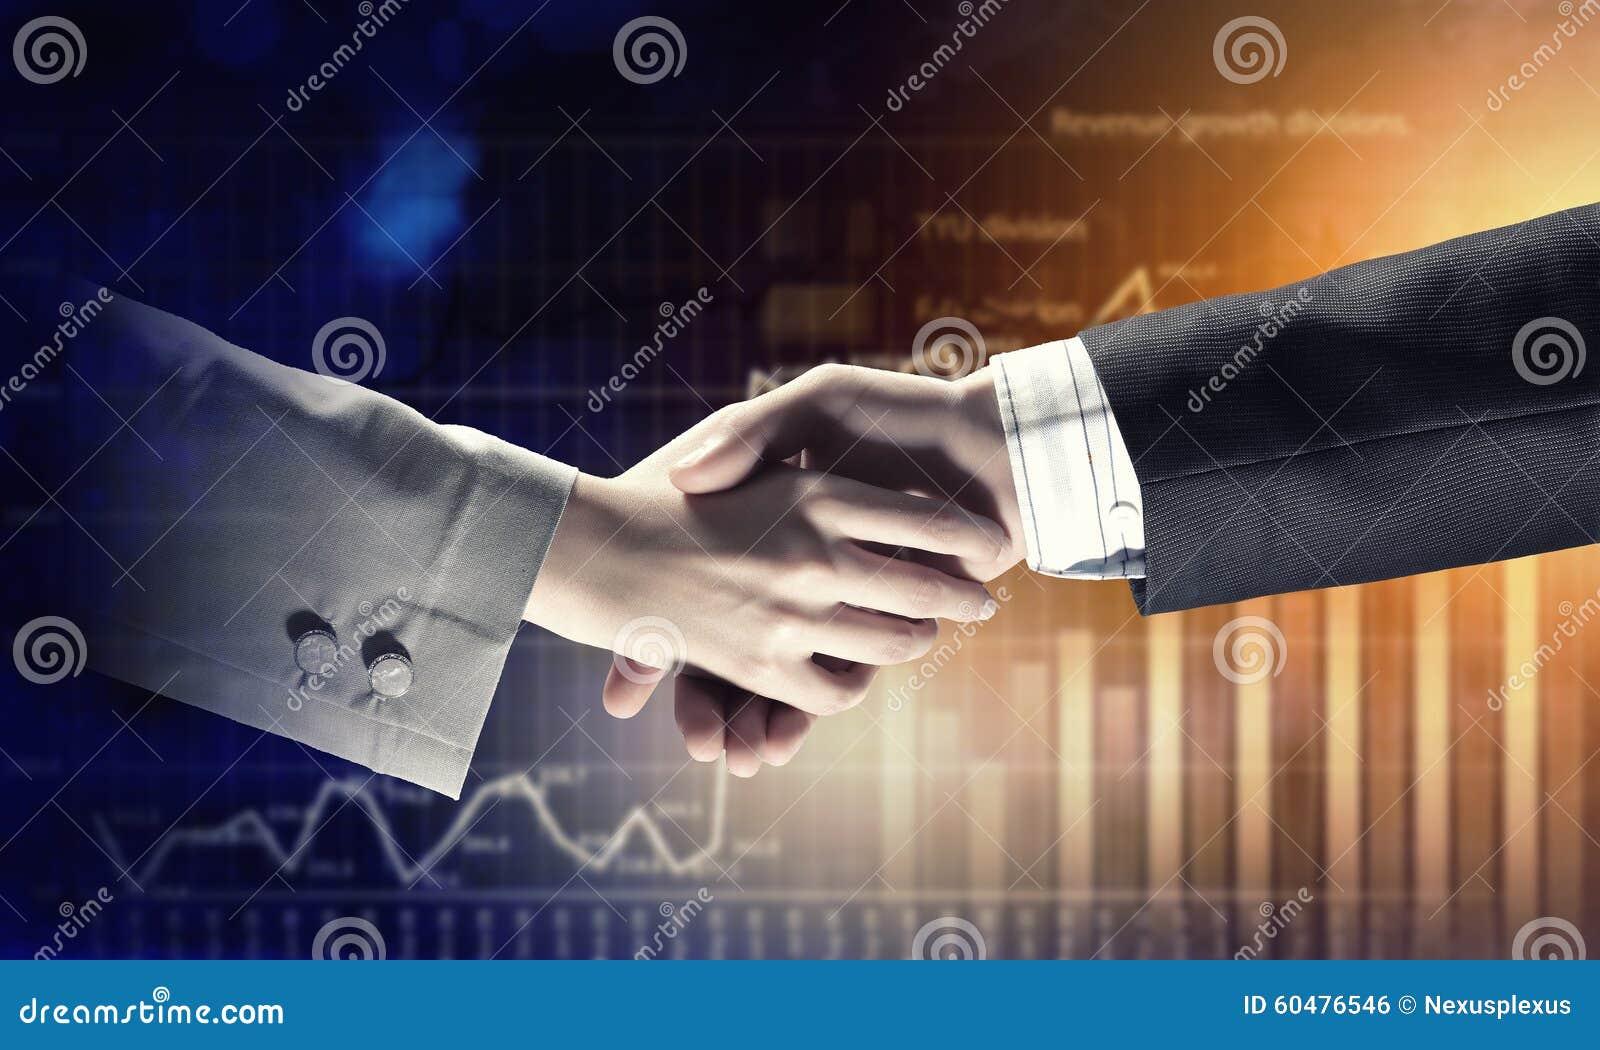 how to close a partnership deal